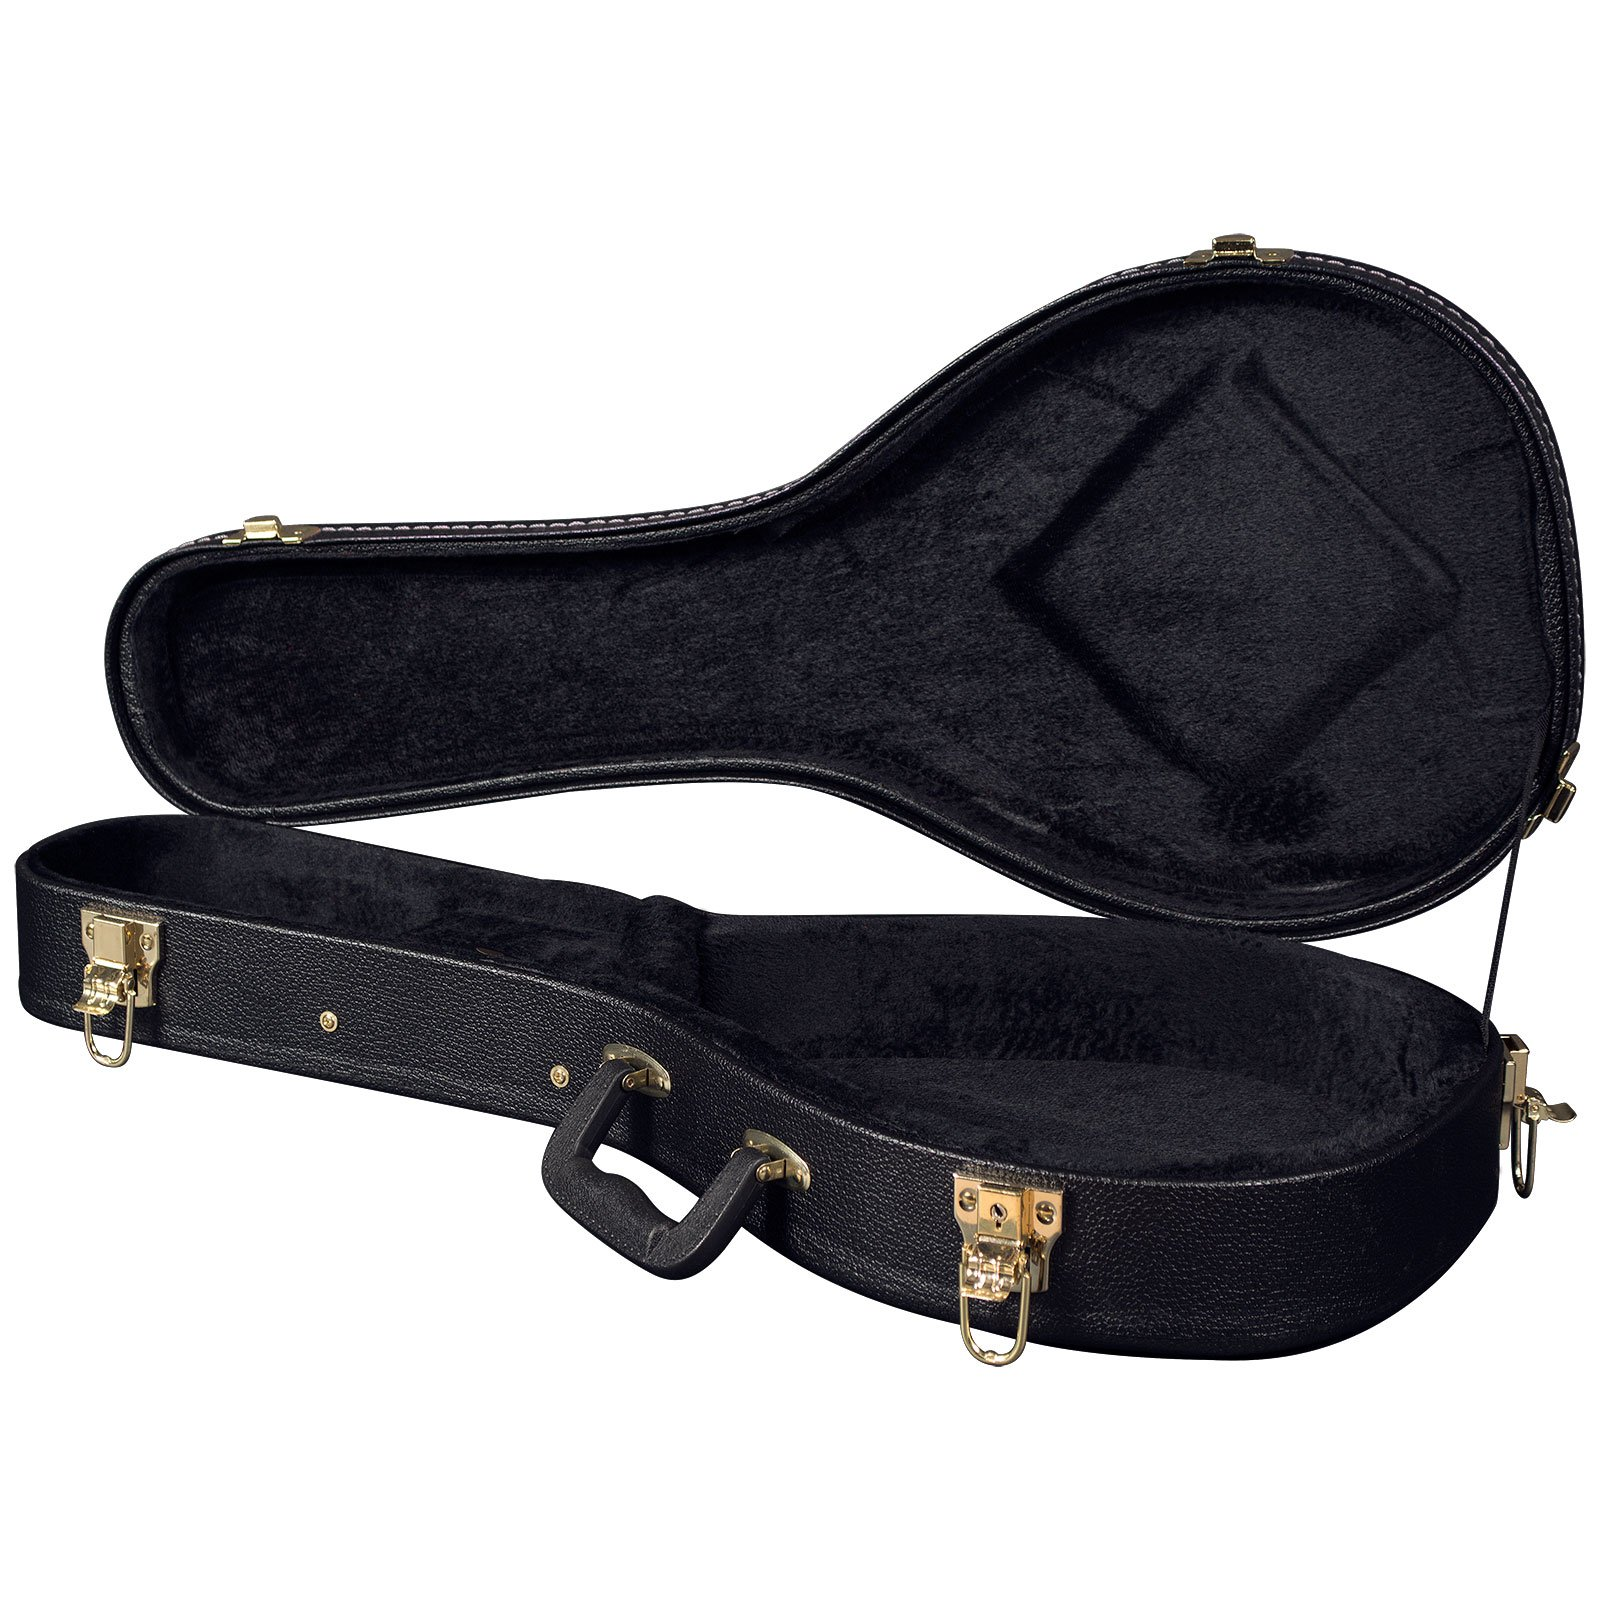 Carrion C-3603 Black Hardshell Octave Mandolin Case